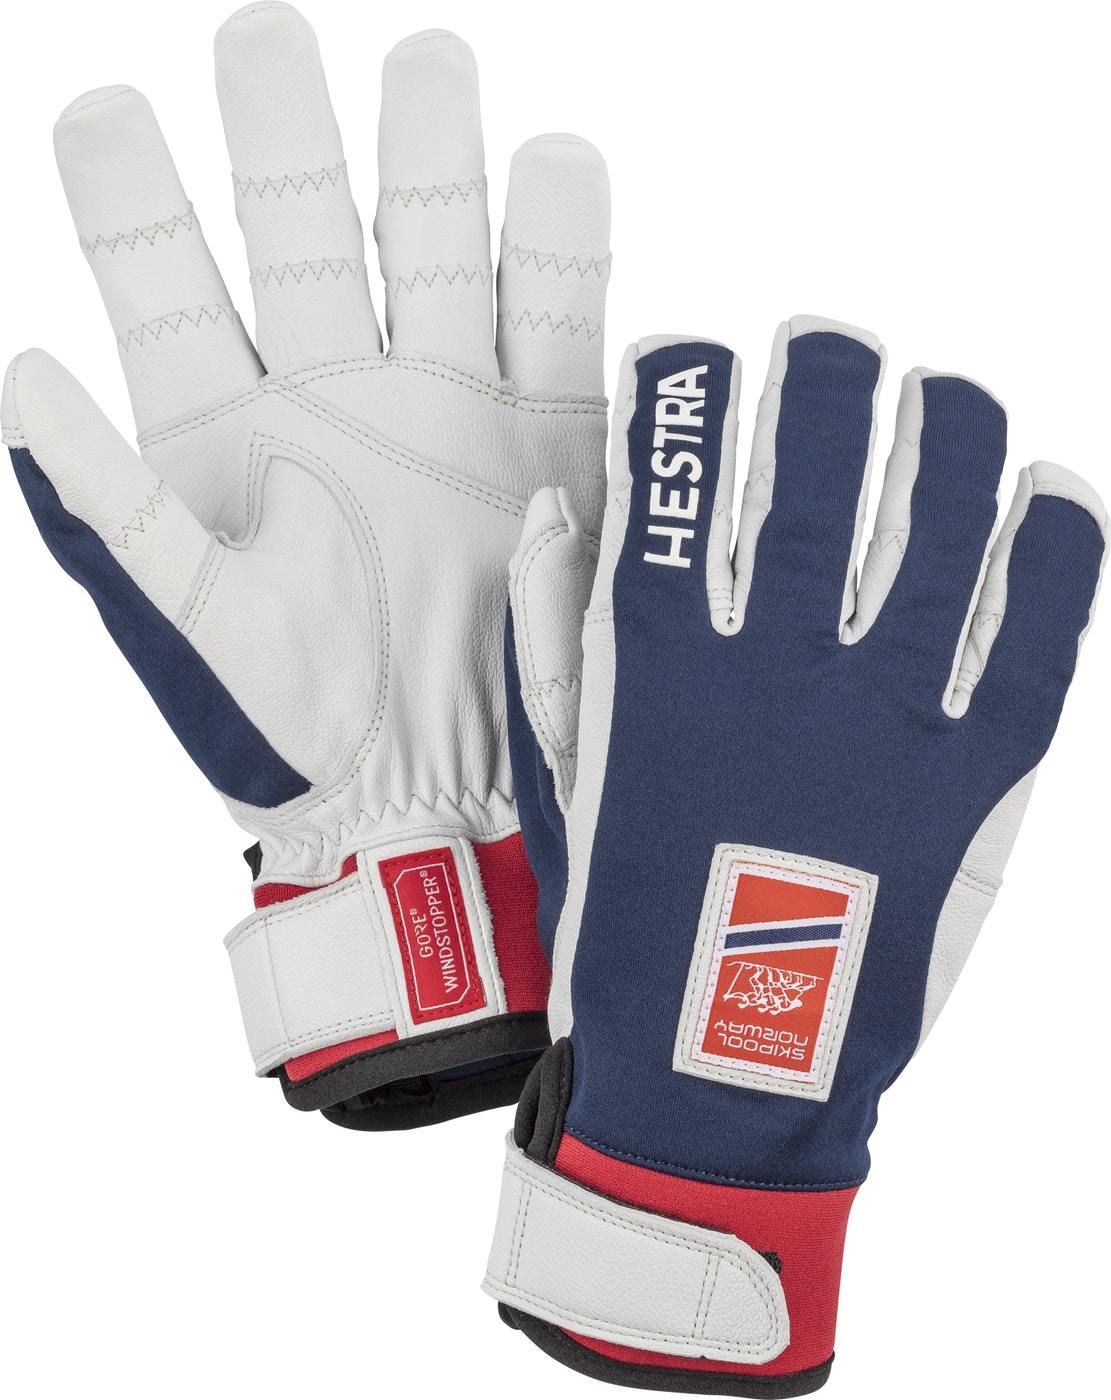 Hestra Ergi Grip Active 32950-280-560